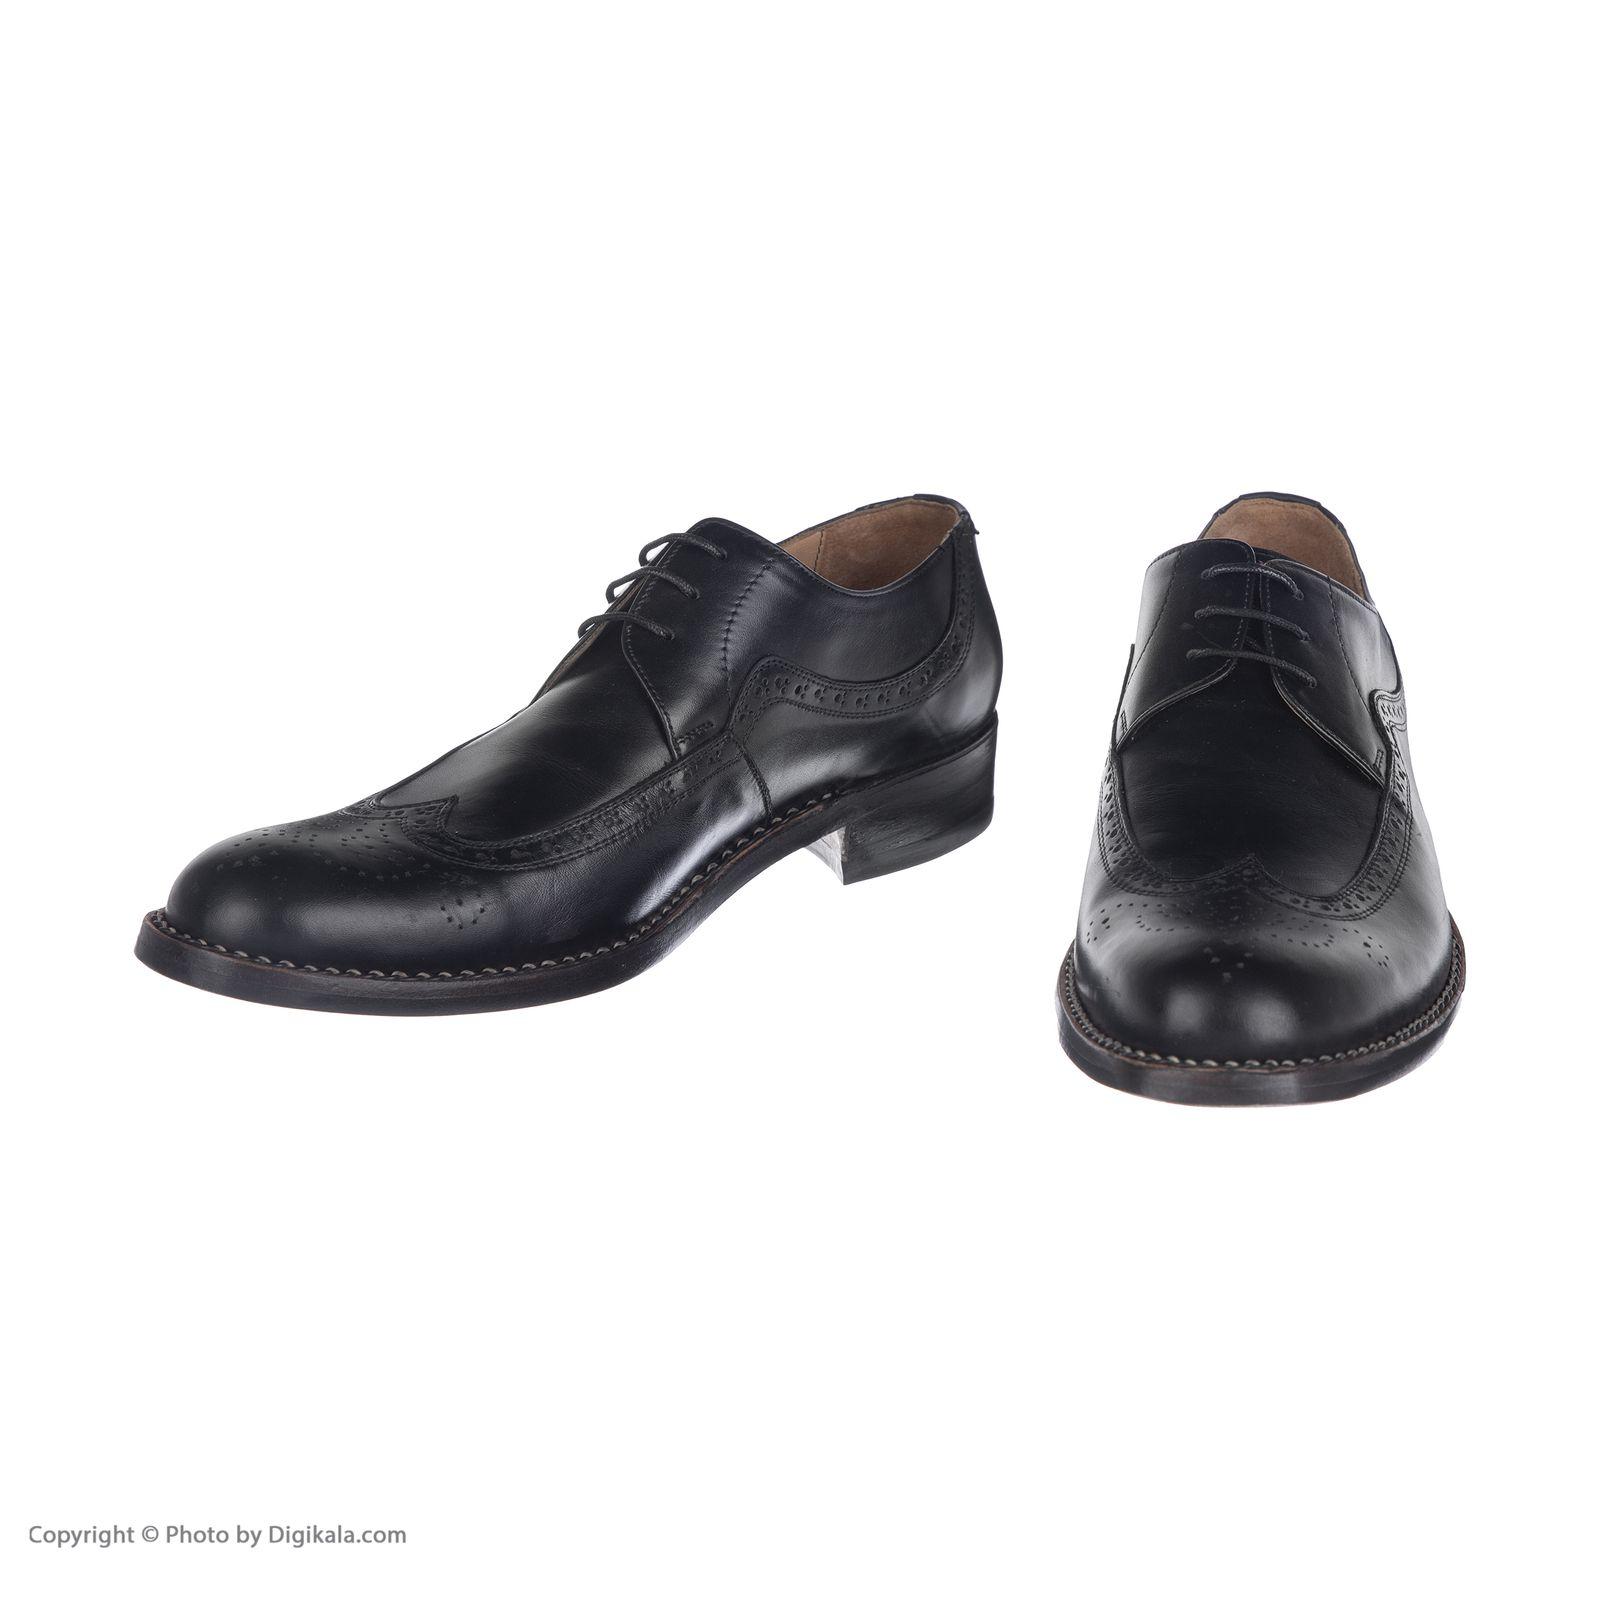 کفش مردانه نظری کد 401 -  - 4